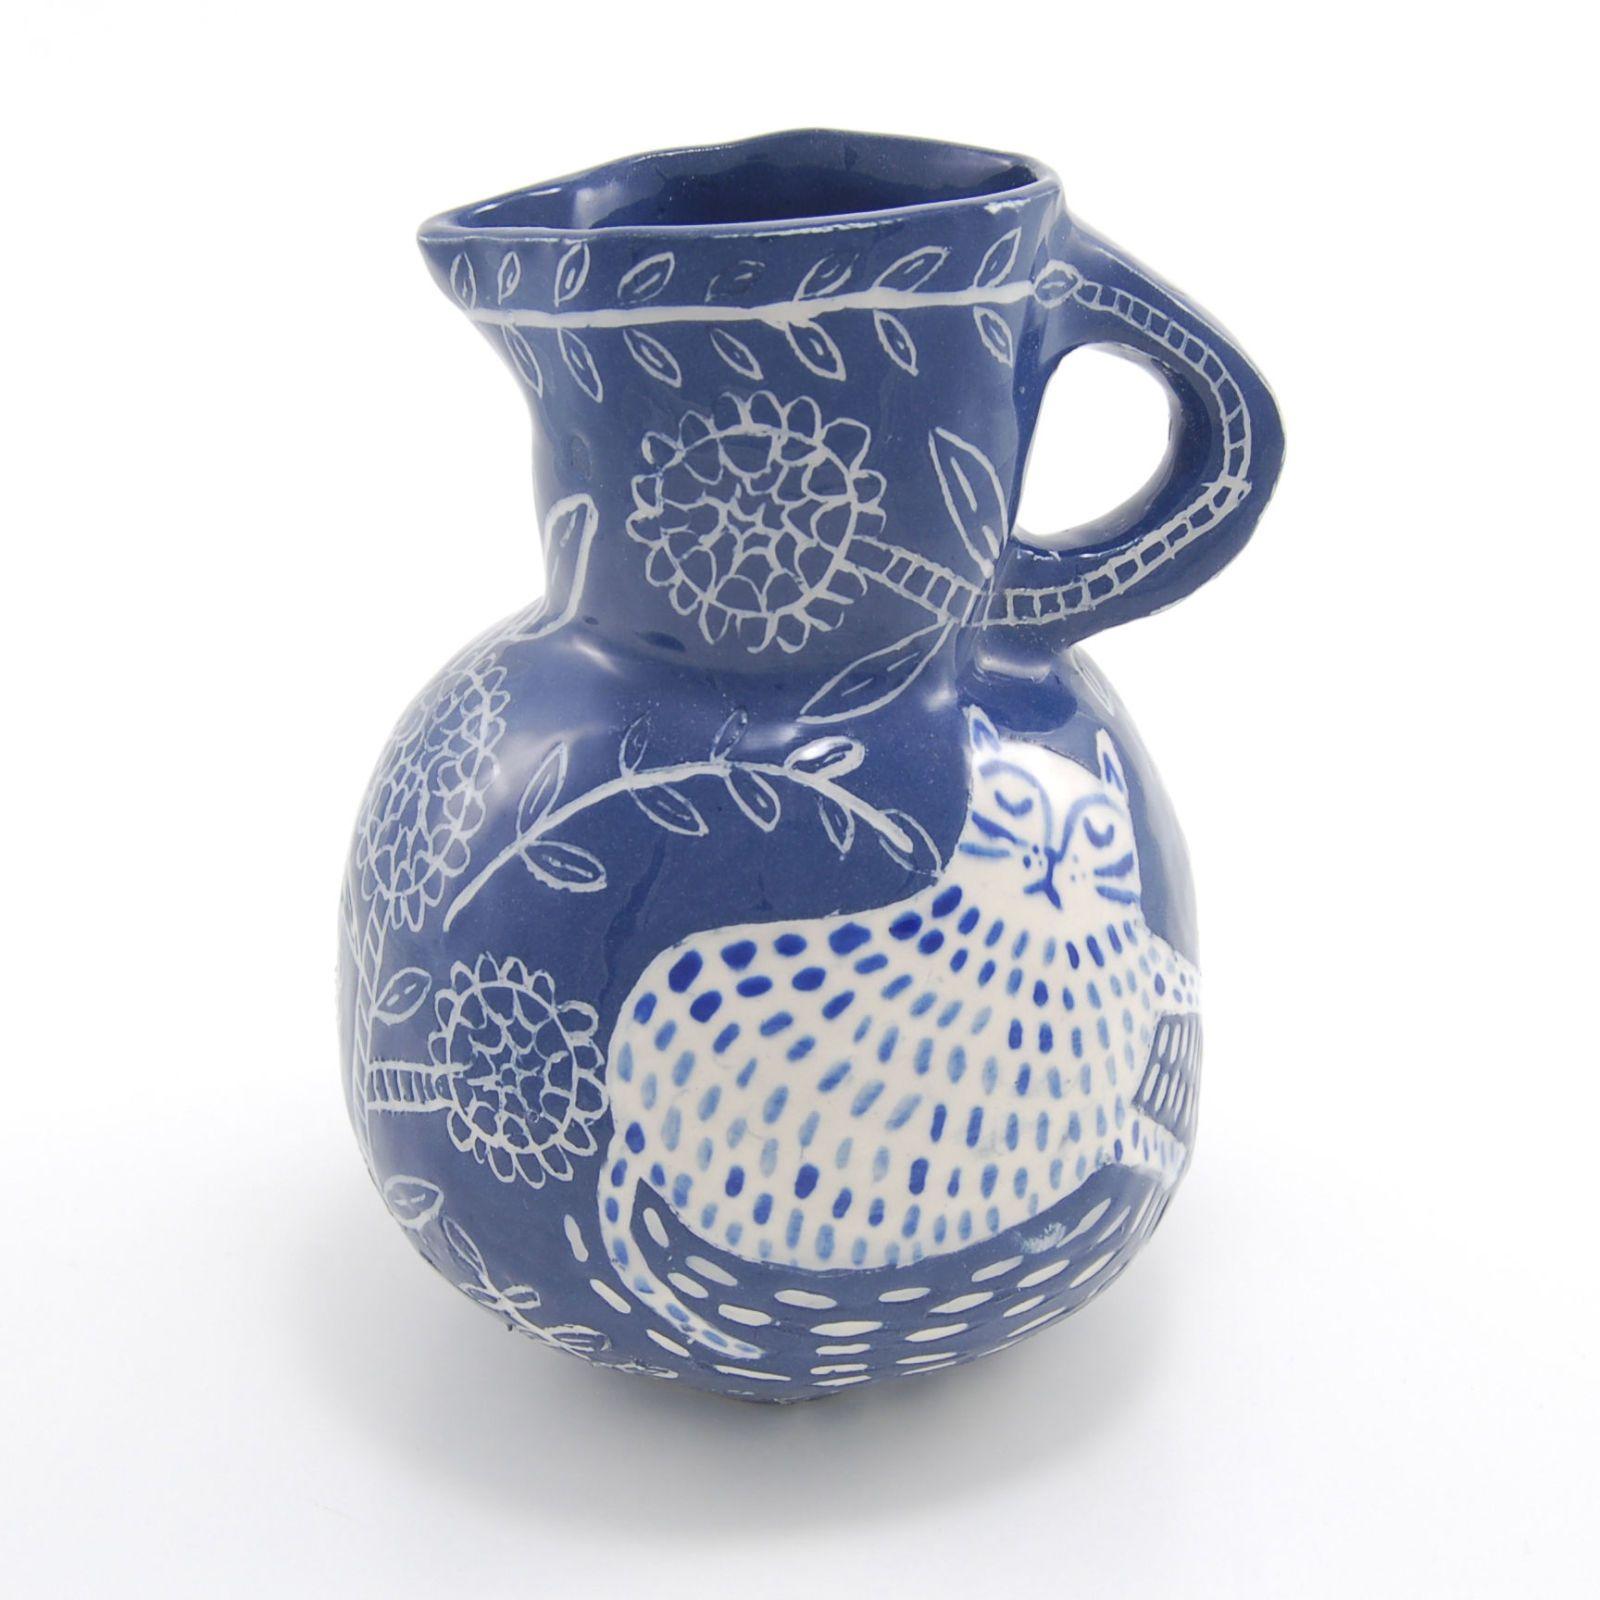 Christmas gift ideas for artists Ceramics, Vintage jugs